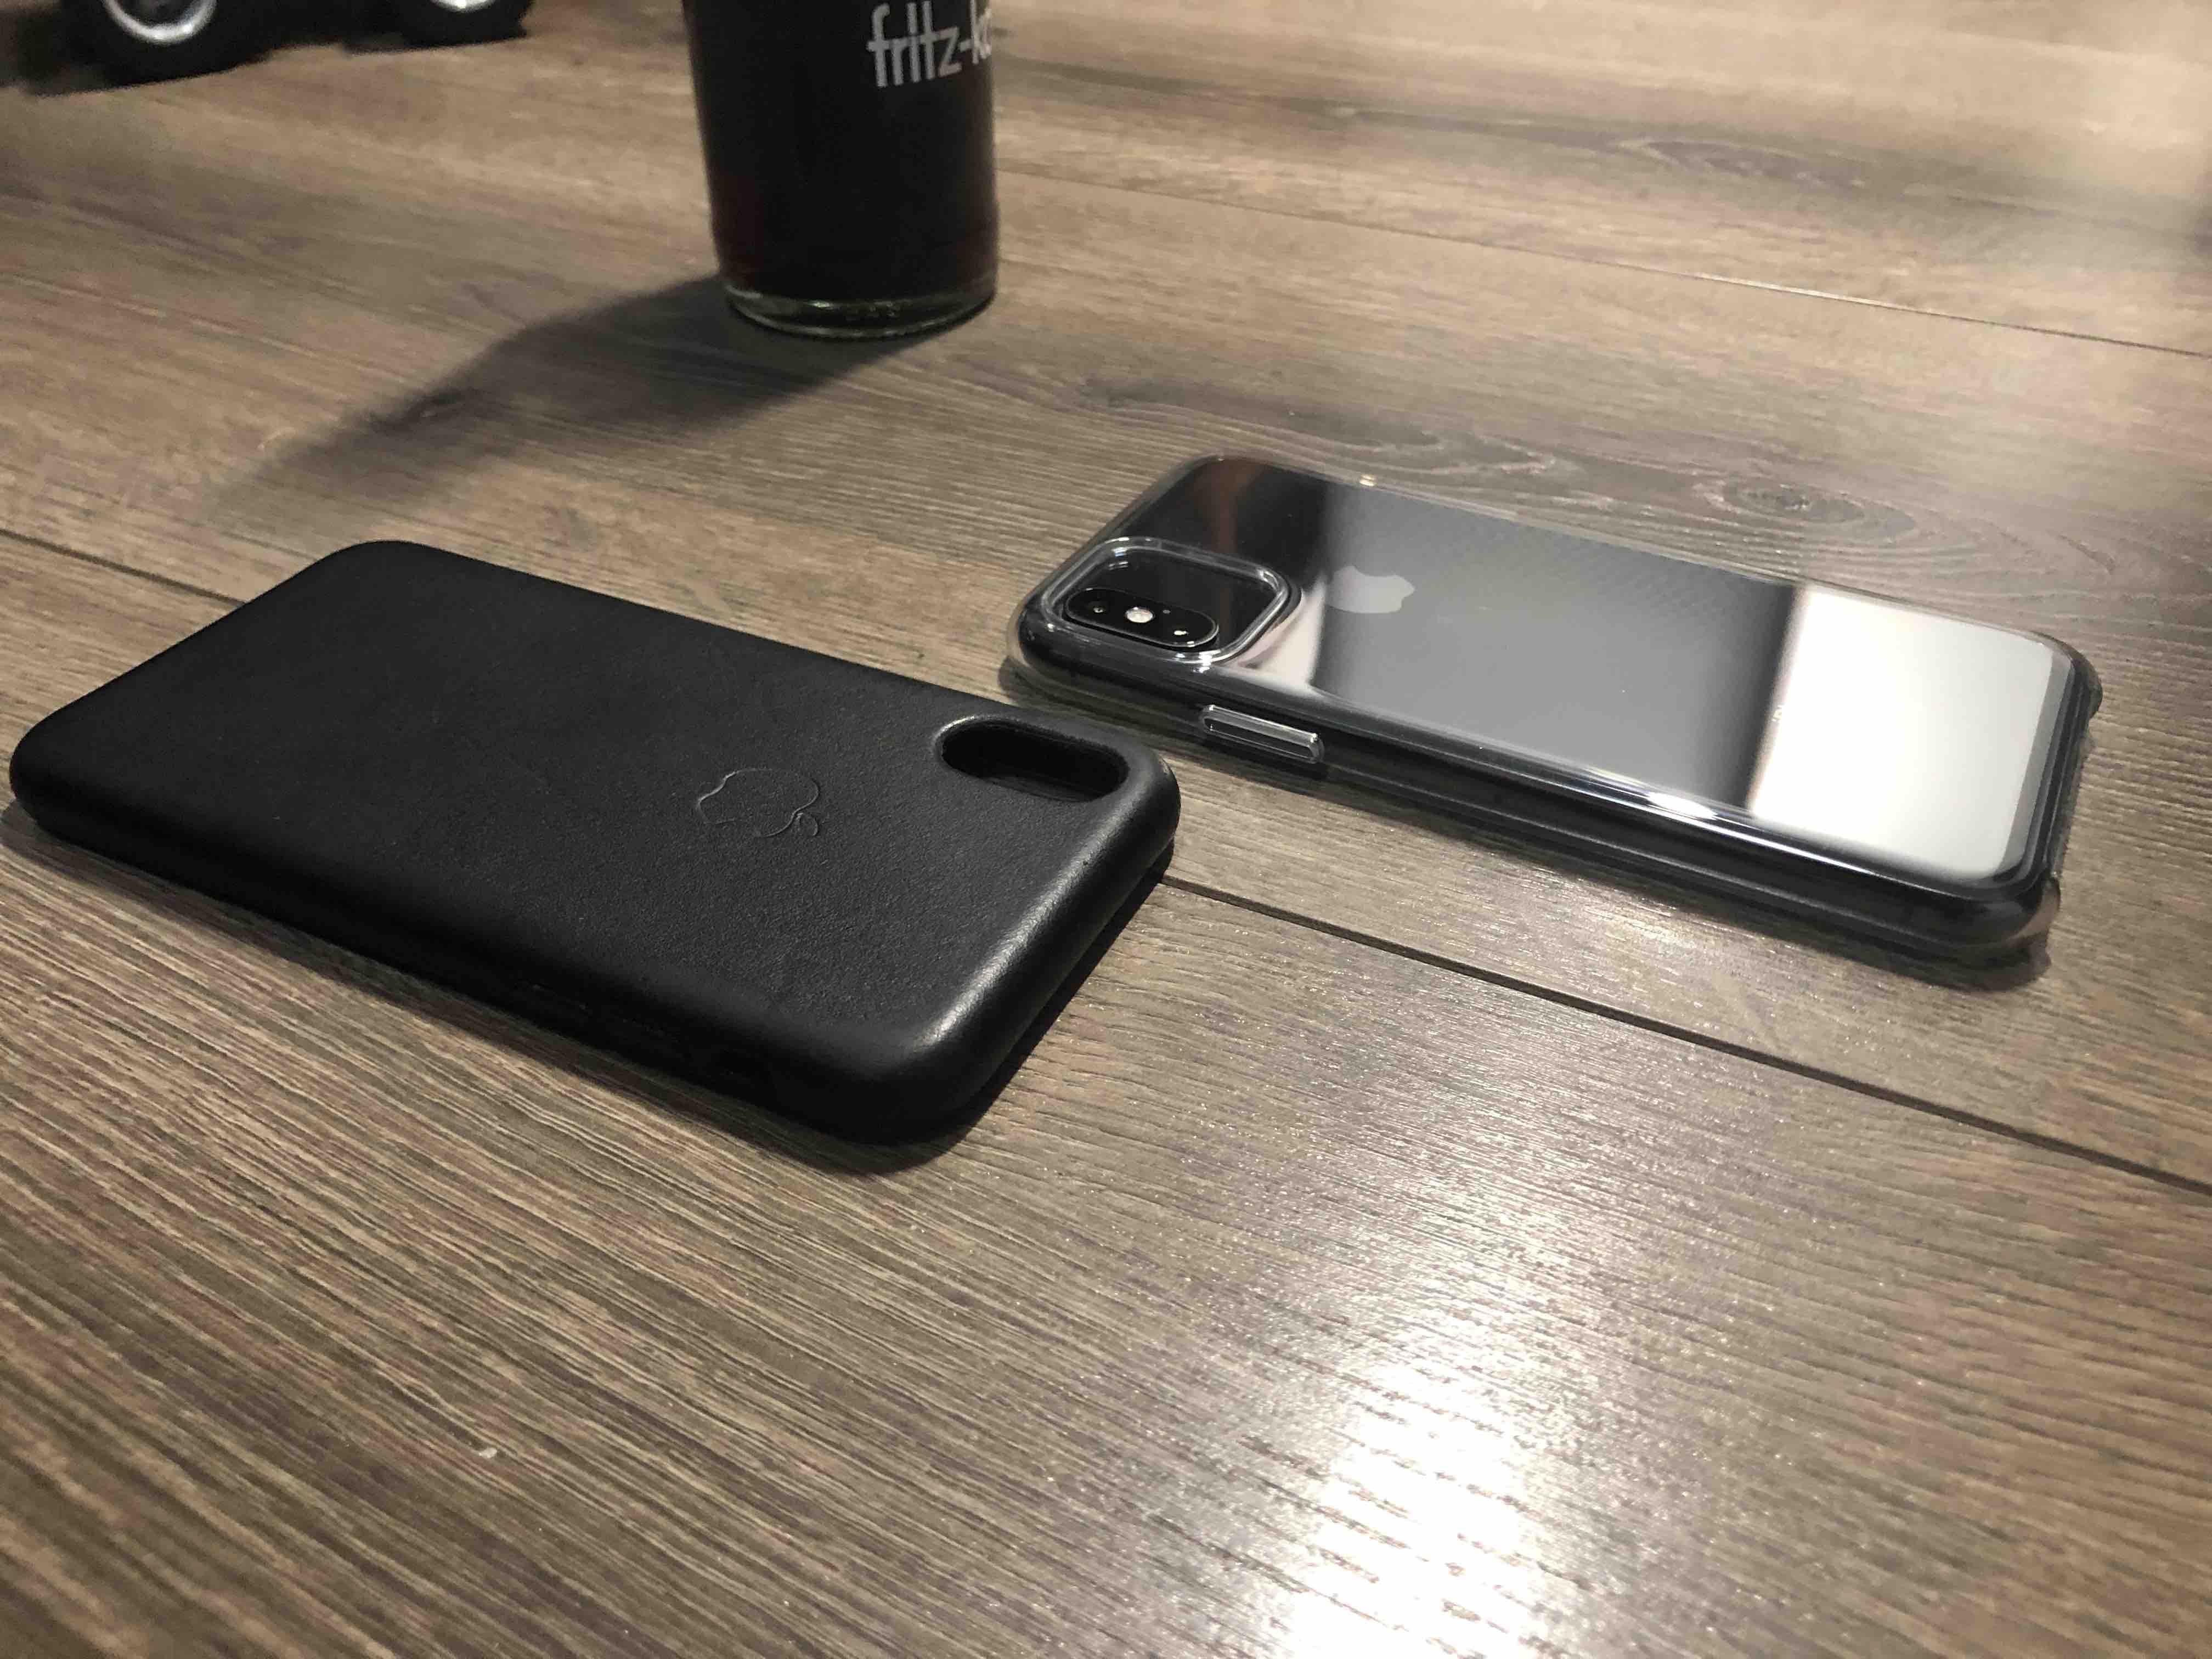 Pruhledny kryt pro iPhone 11 Pro